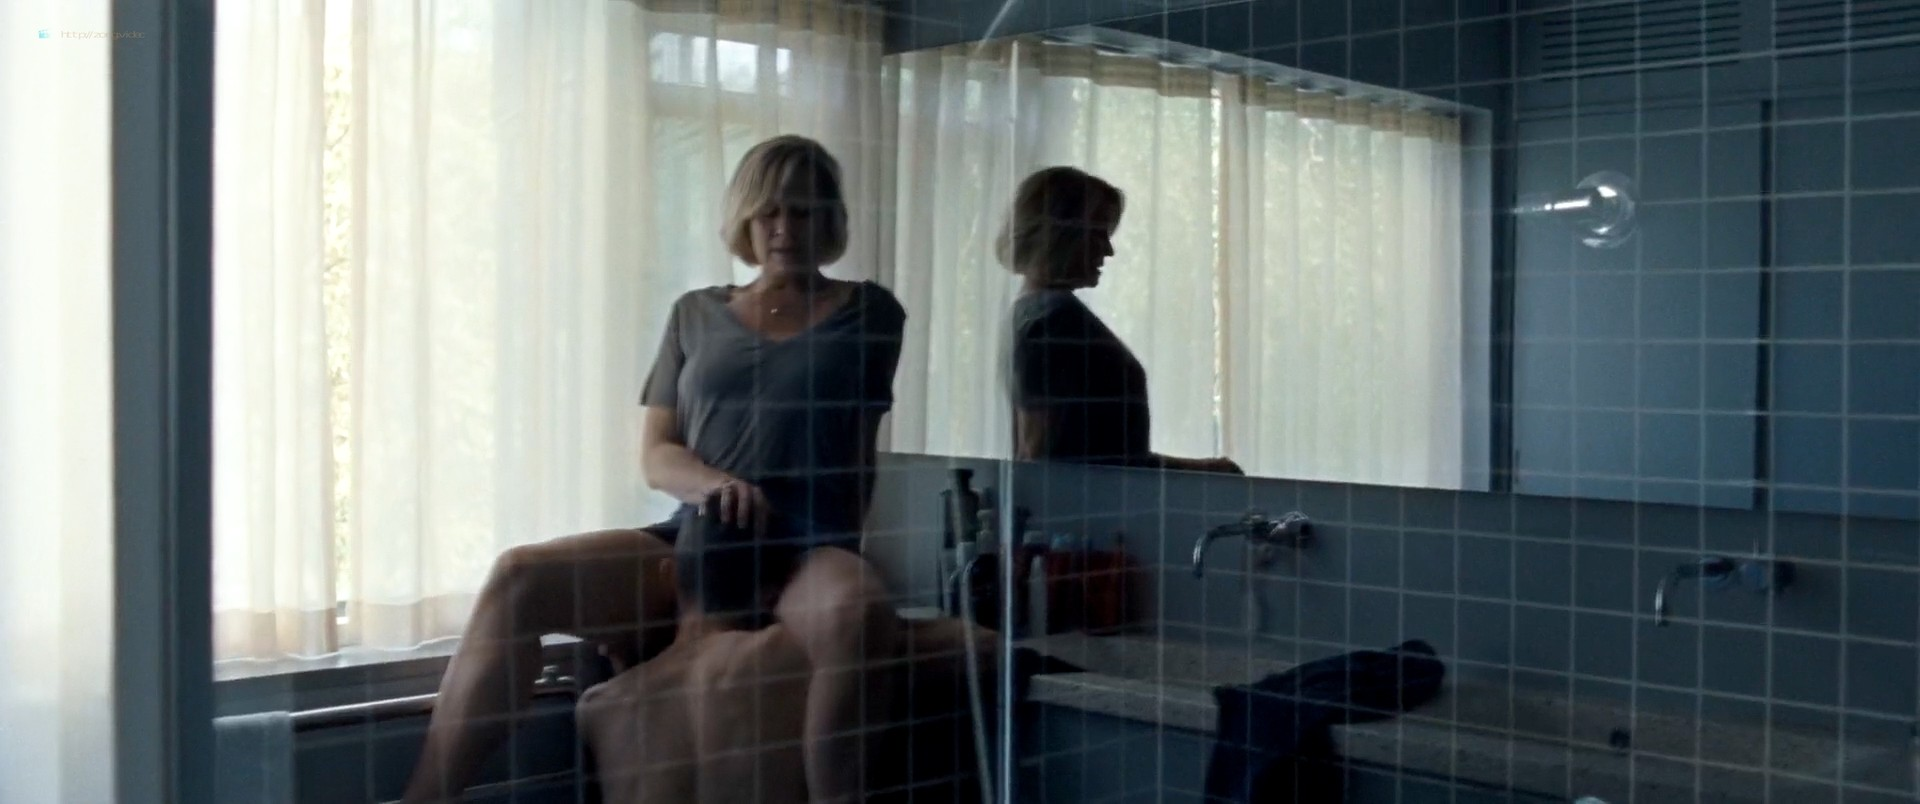 Trine Dyrholm nude explicit blow job and hot sex - Queen of Hearts (DK-2019) 1080p WEB (4)